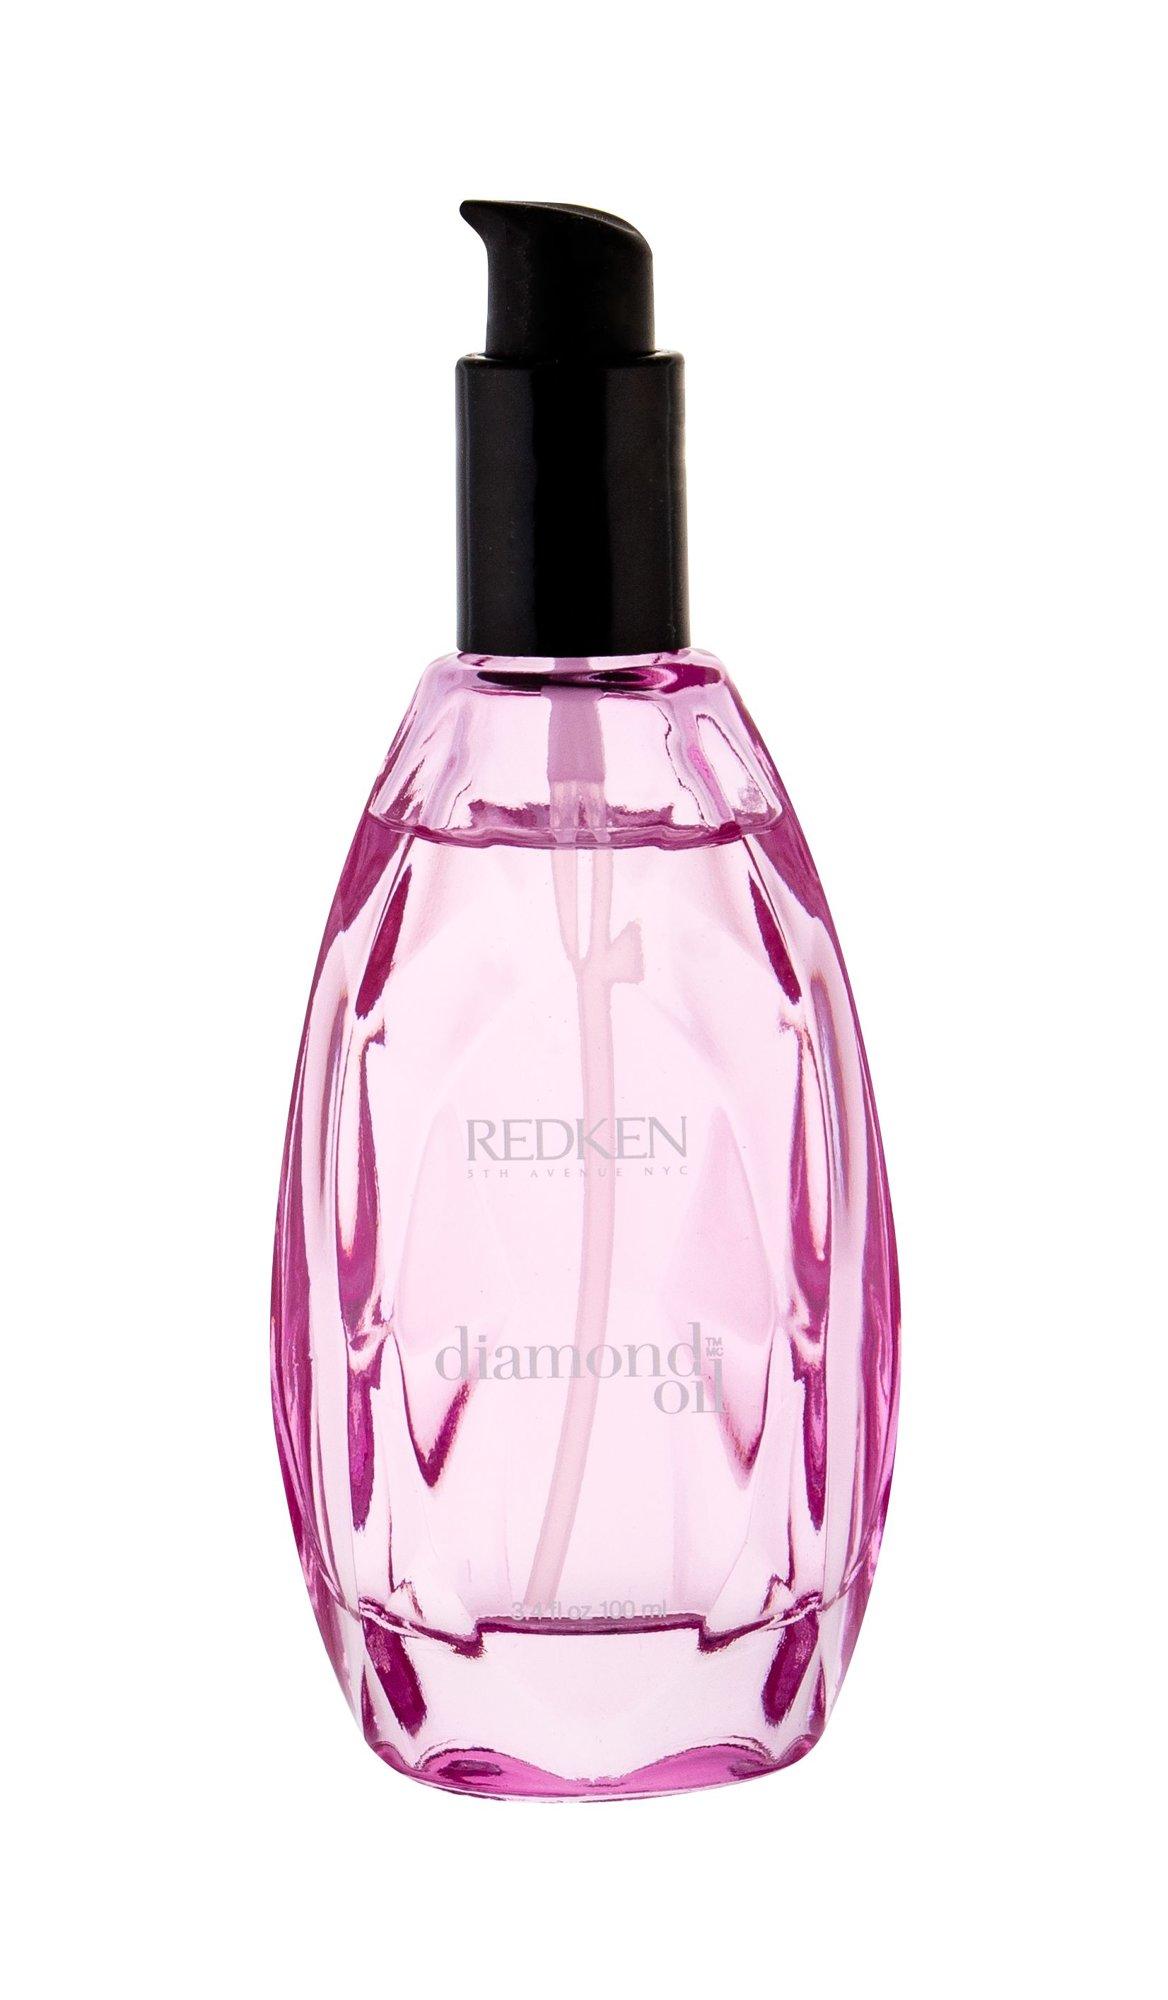 Redken Diamond Oil Hair Oils and Serum 100ml